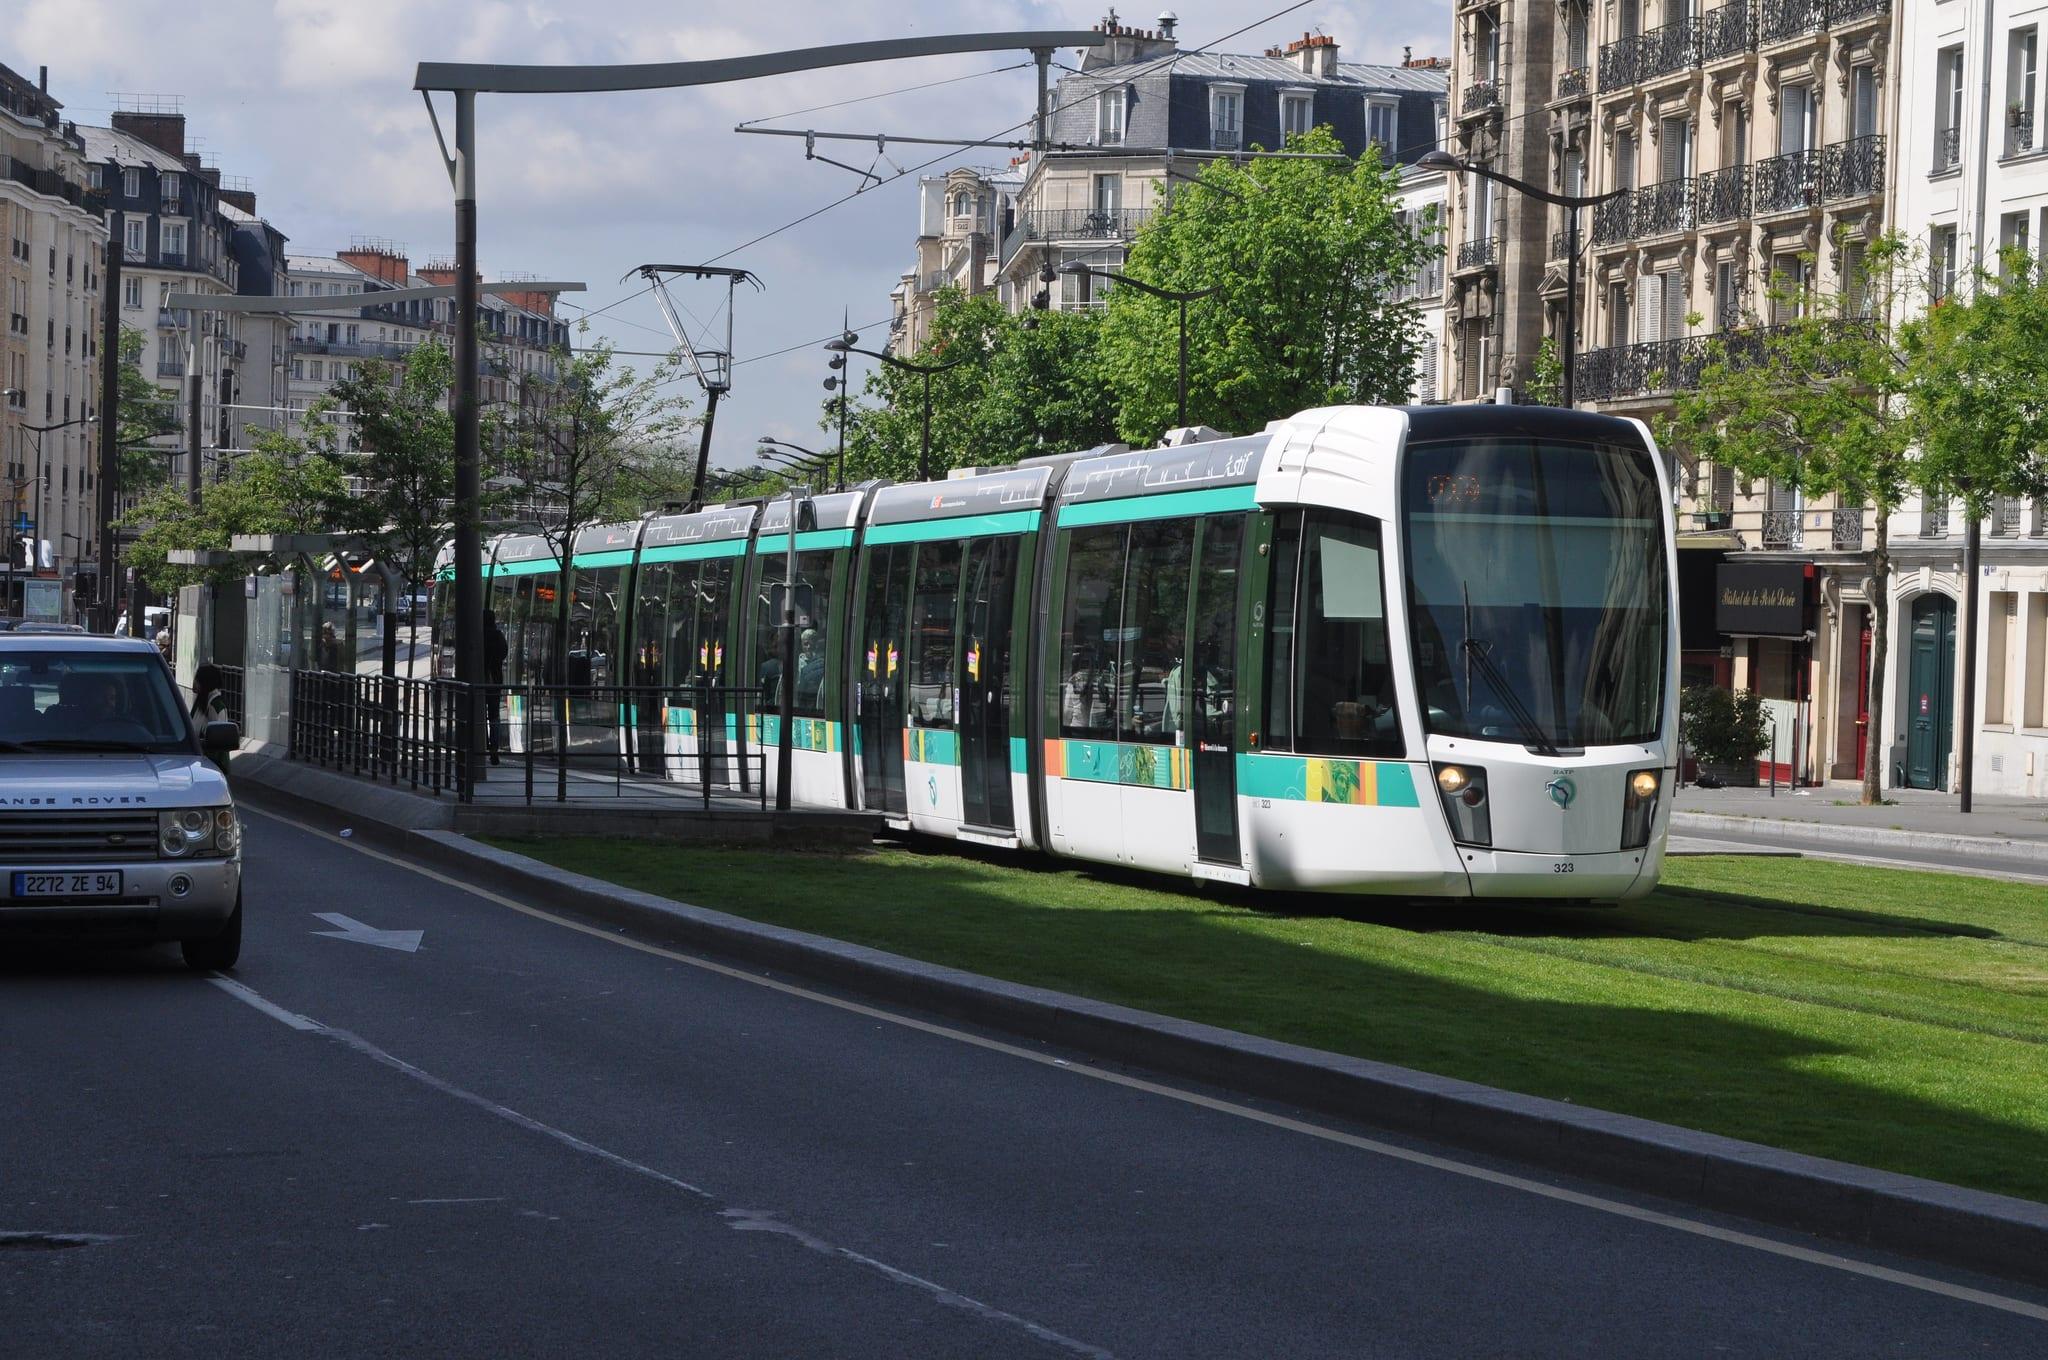 A Paris tram. Photo by Phil Beard, via Flickr creative commons.